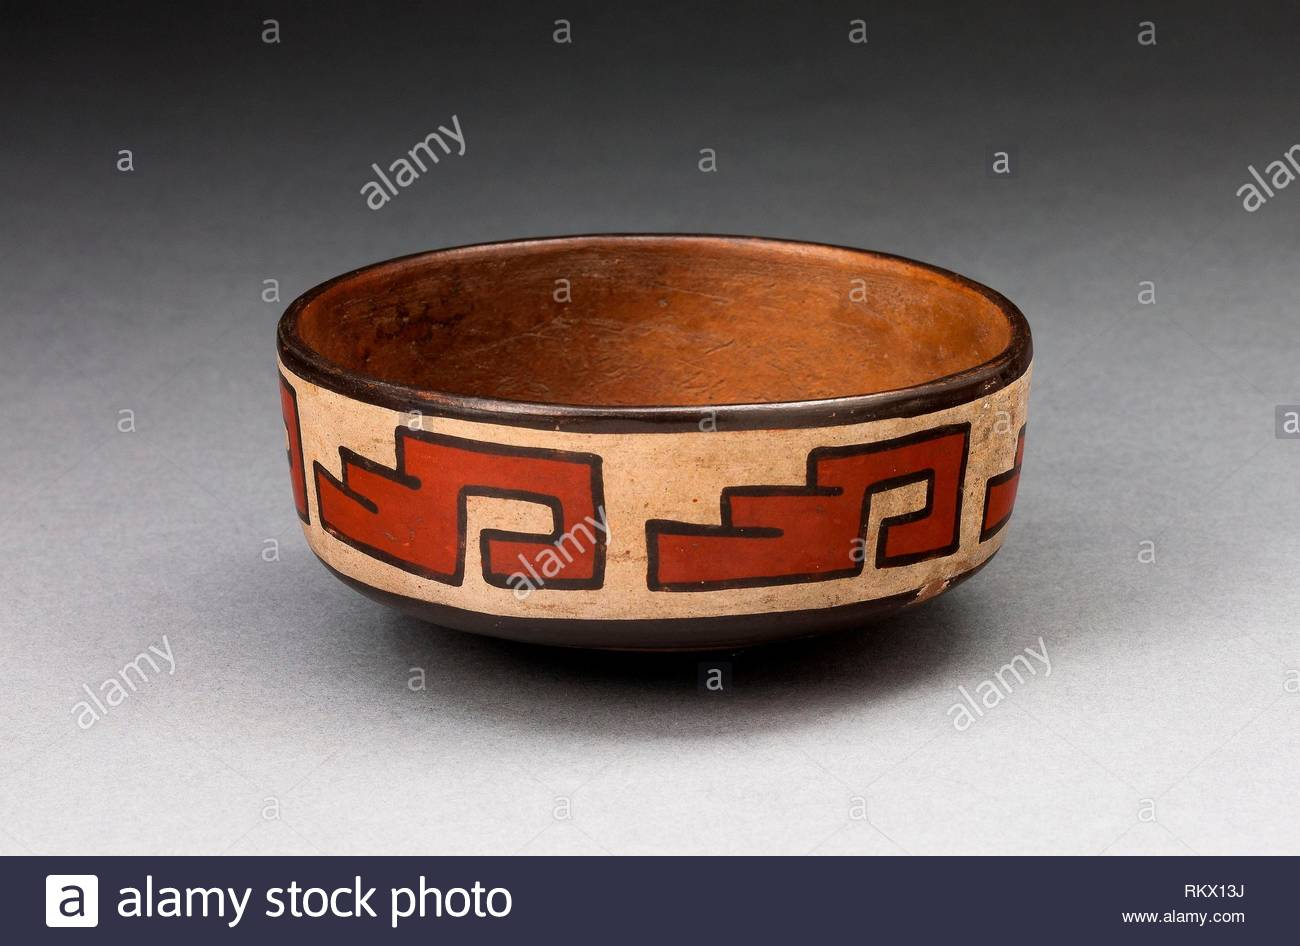 bowl with stepped fret motif 180 bcad 500 nazca south coast peru artist nazca origin nazca valley date 180 bc 500 ad medium RKX13J